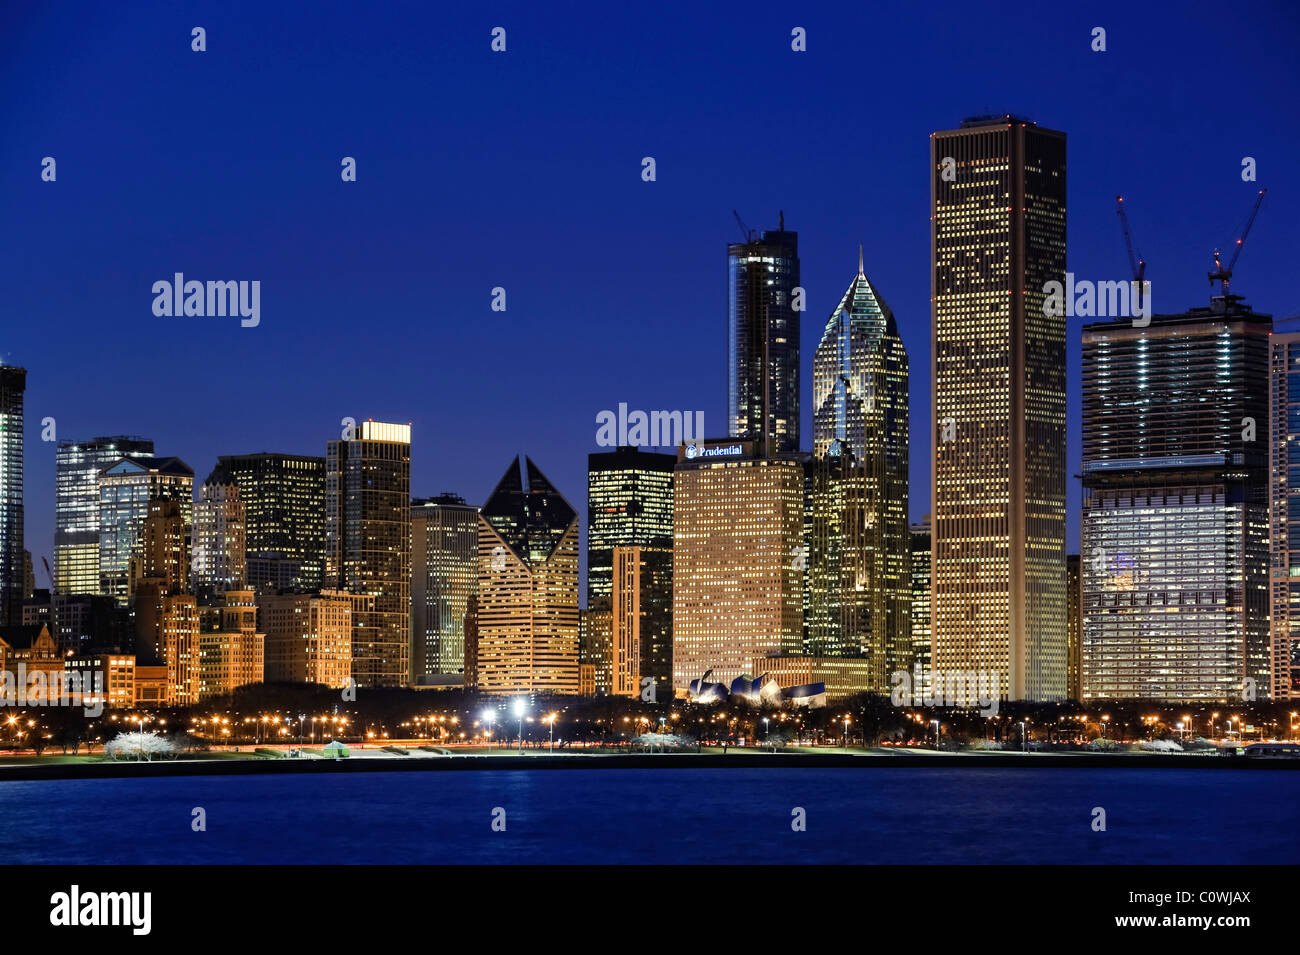 Downtown Chicago Skyline at dusk, Chicago, Illinois, USA - Stock Image